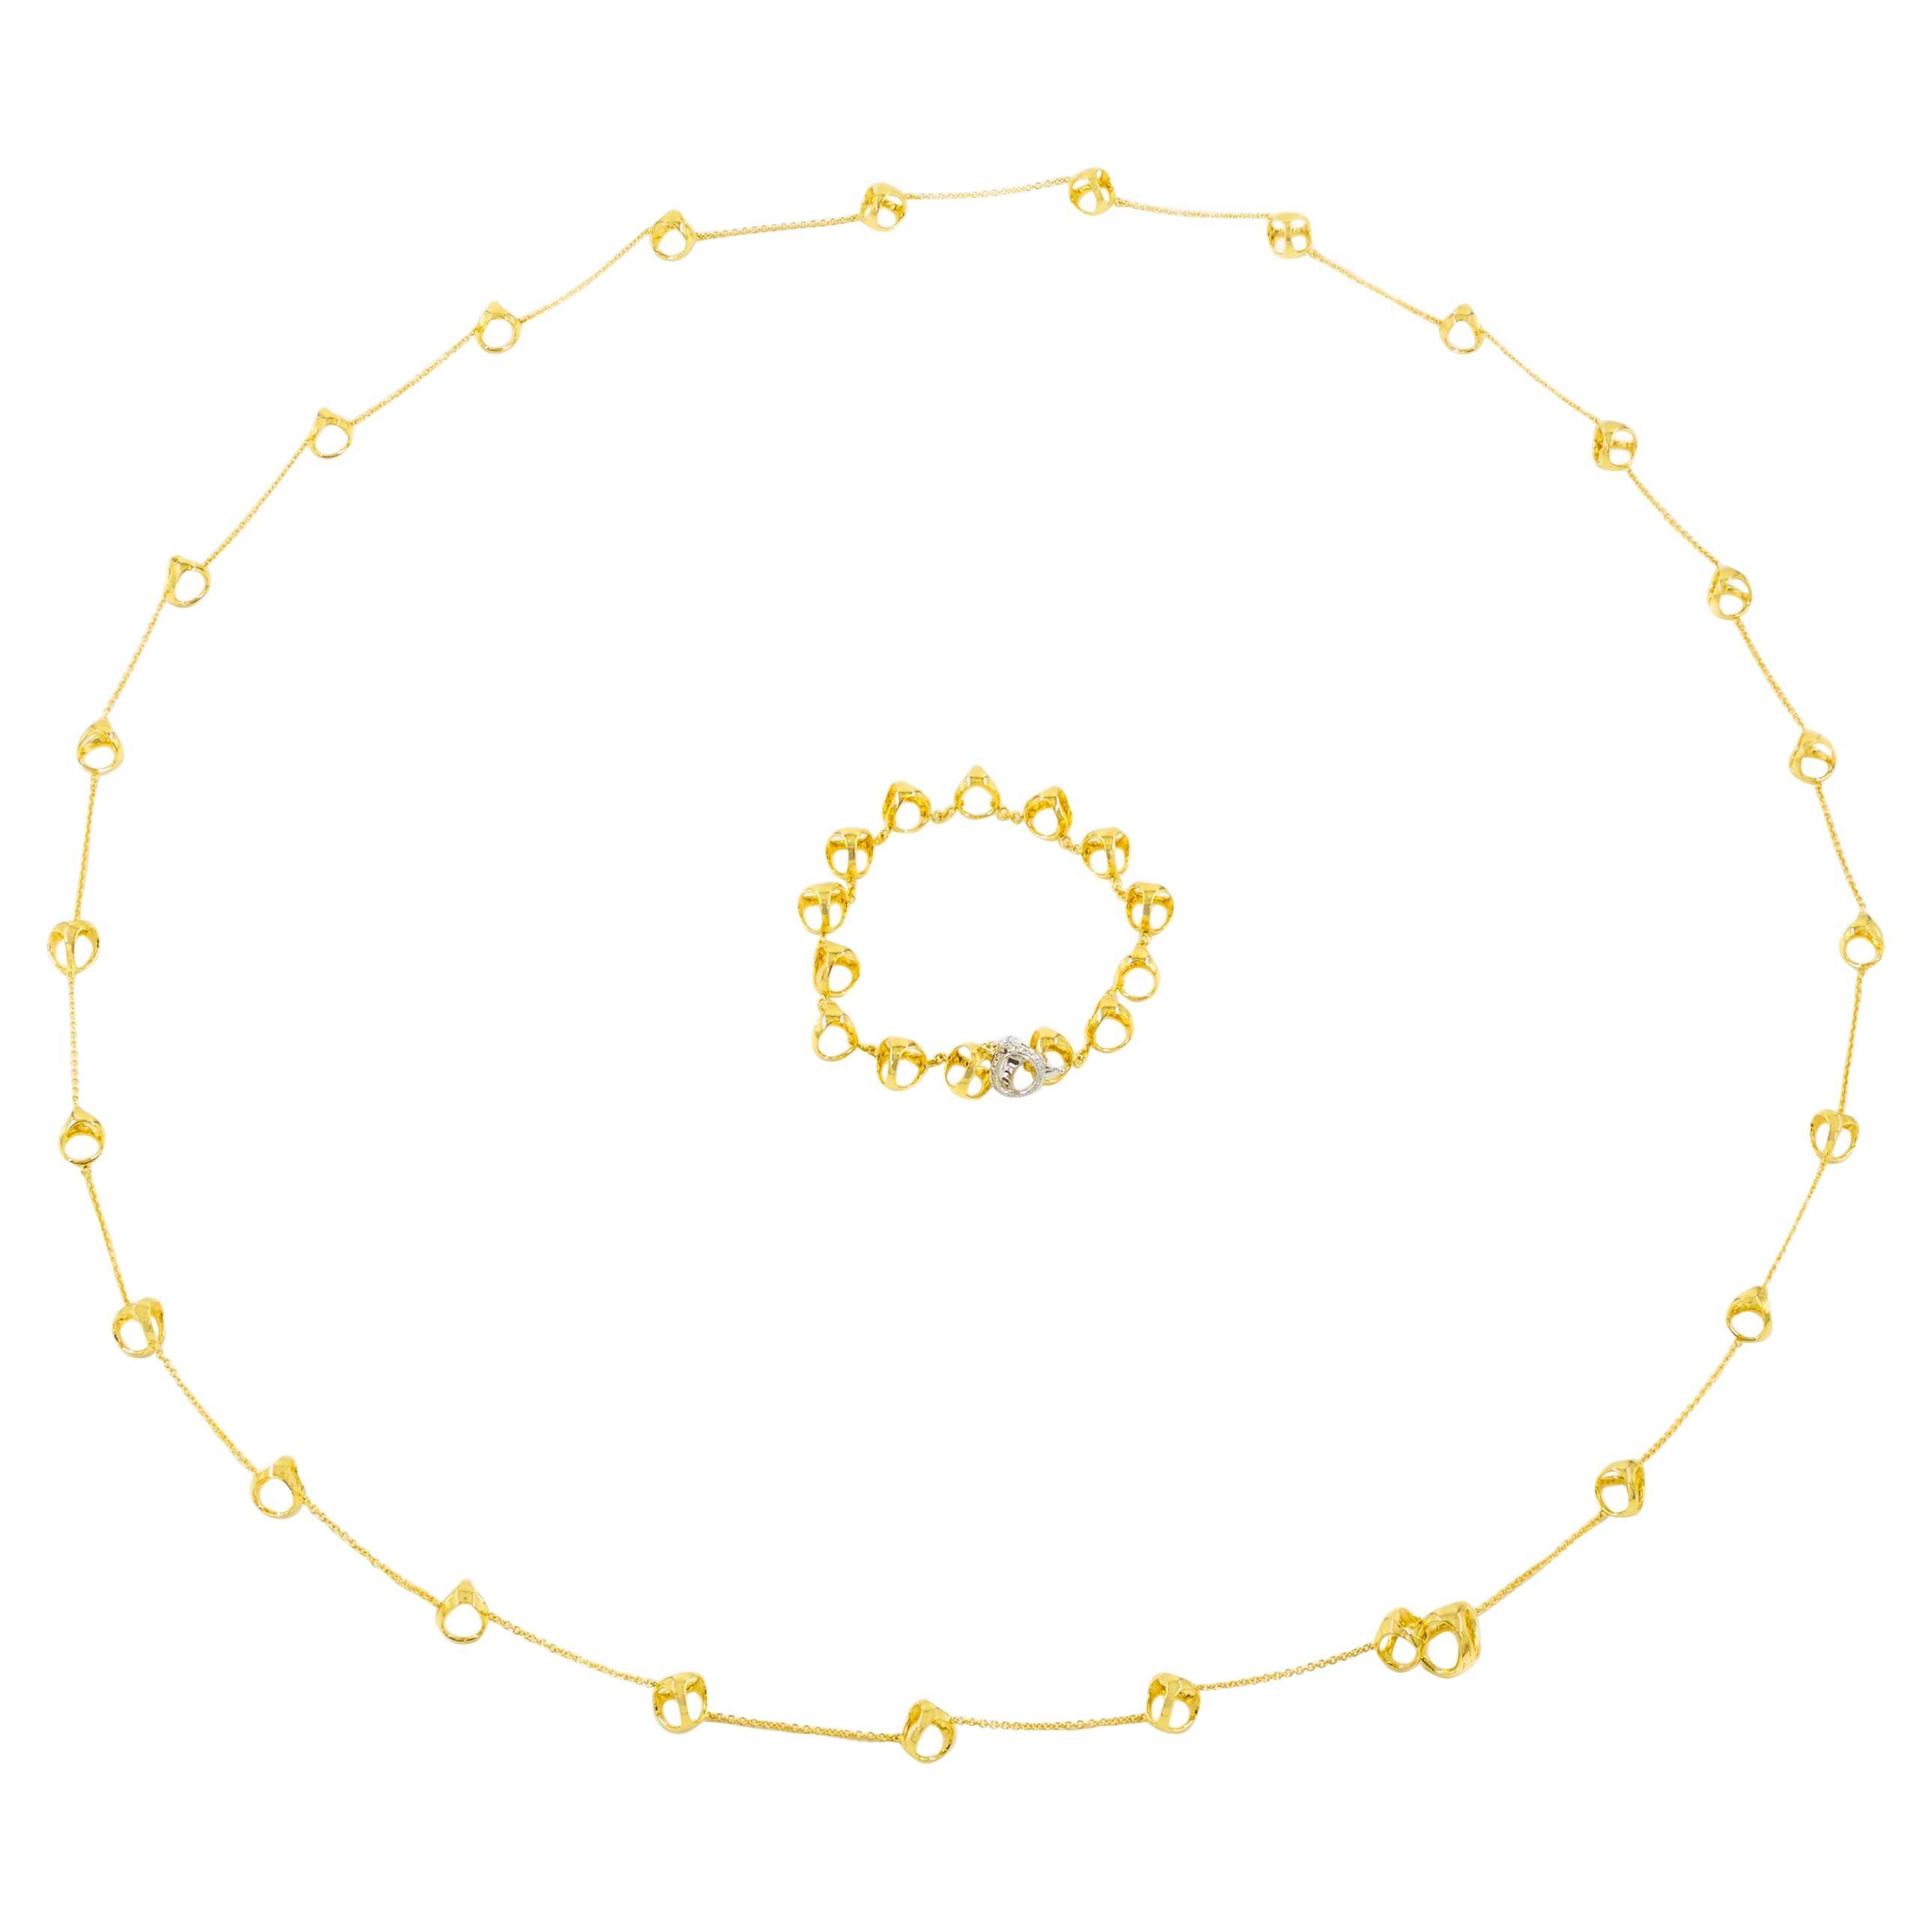 DiModolo Italian 18k Gold and Diamond Necklace and Bracelet